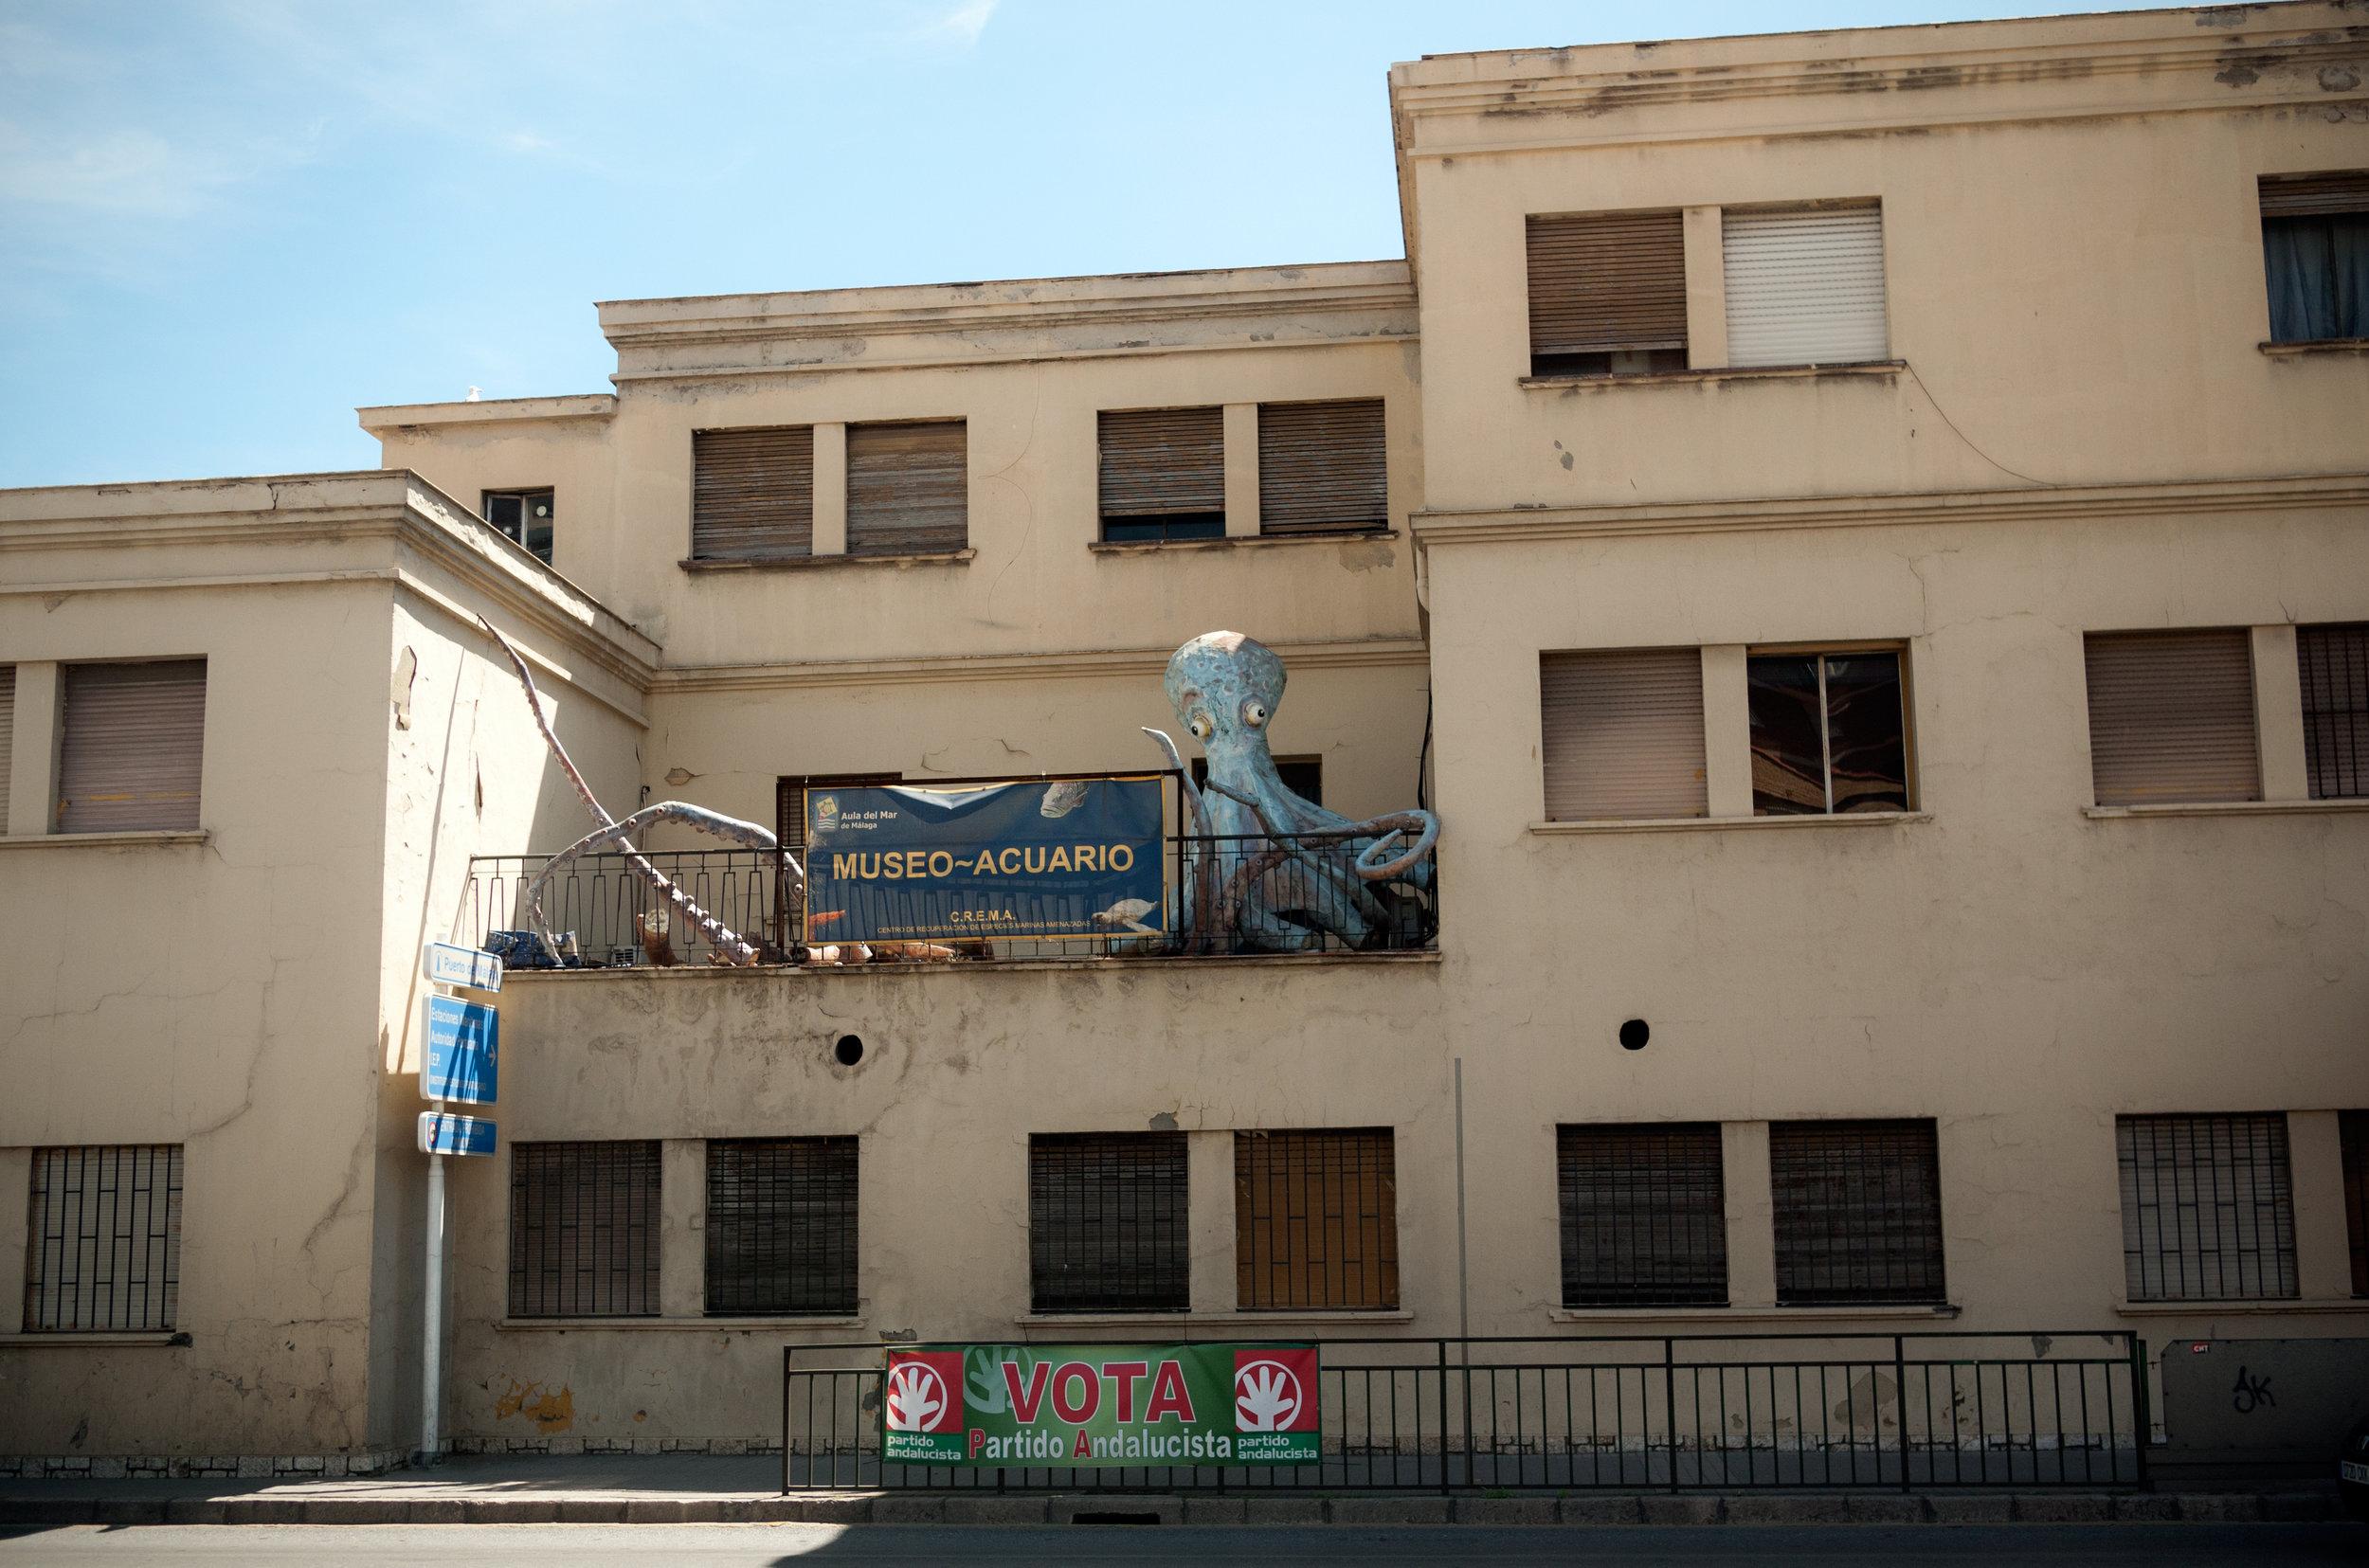 Museo Acuario.jpg